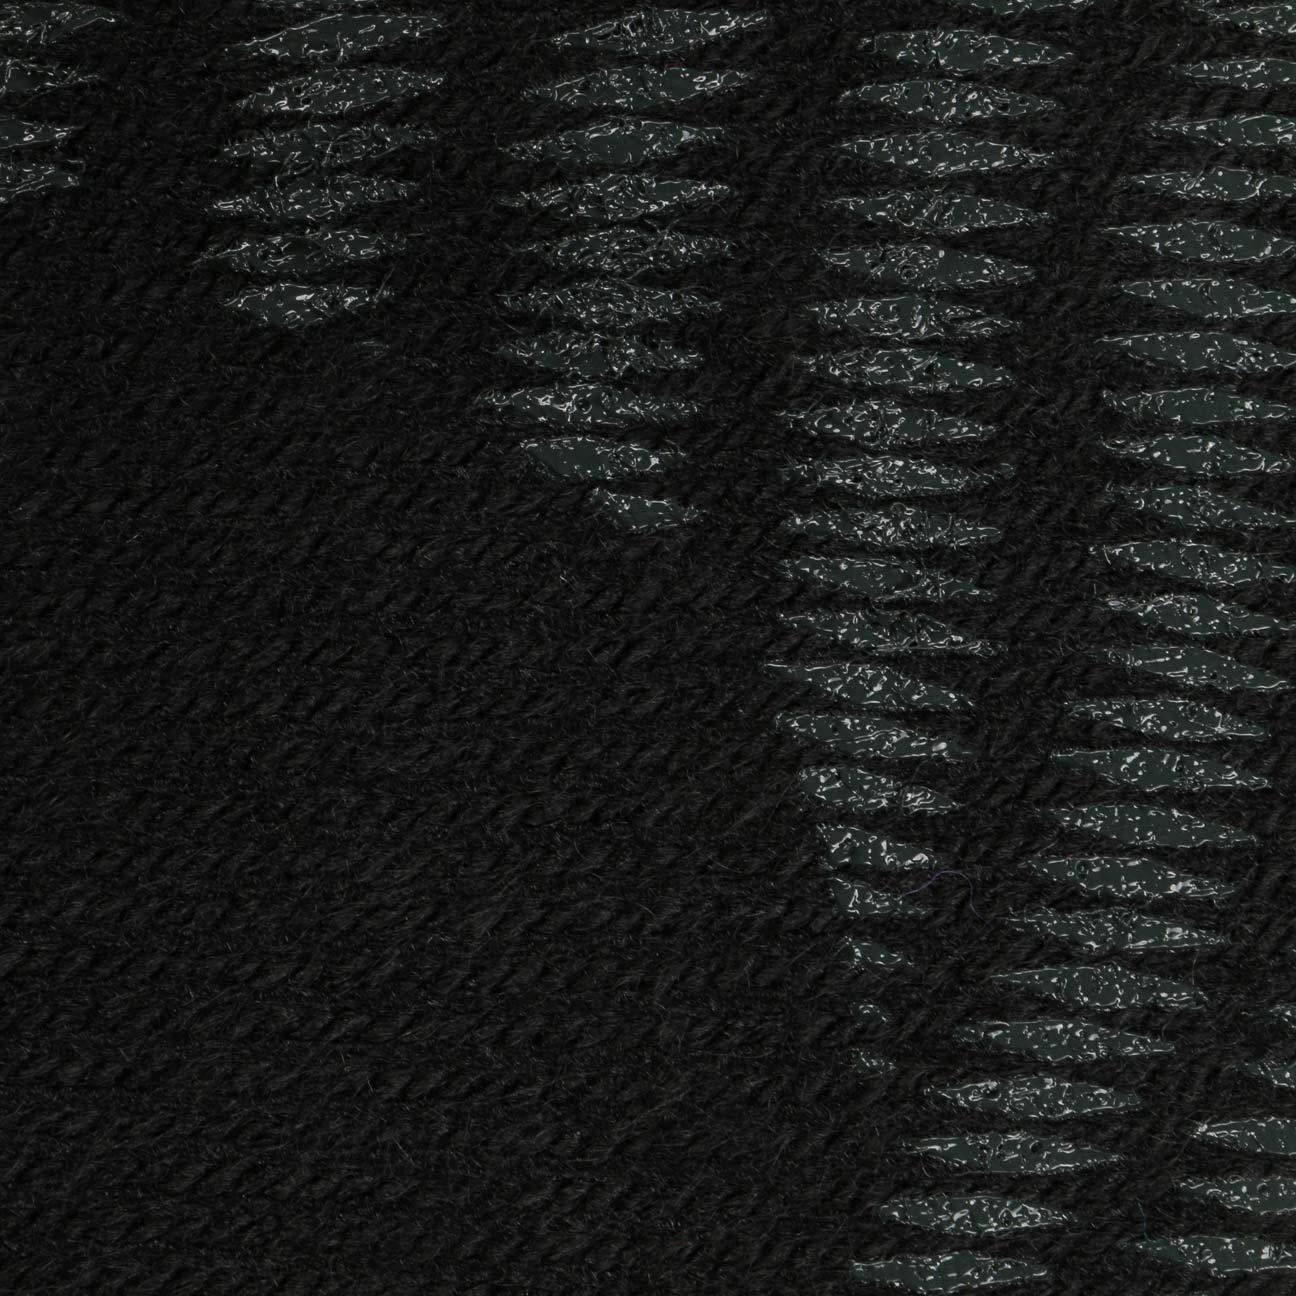 Nike Fleece Neck Warmer Bragas Cuello Unisex Adulto